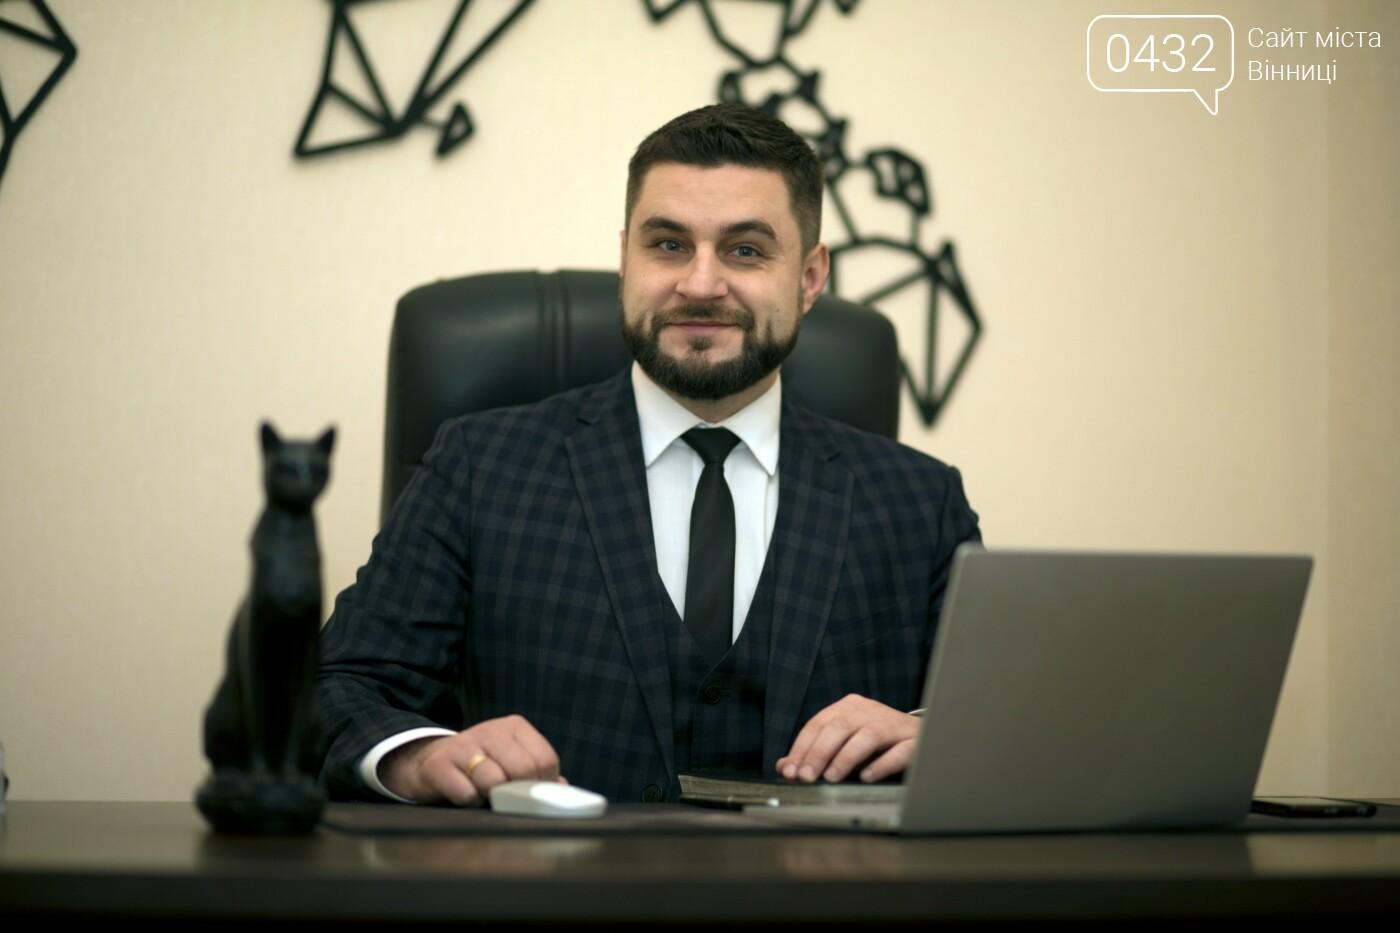 Как адвокаты избавили клиента от долгов: адвокат по кредитам Винница, фото-3